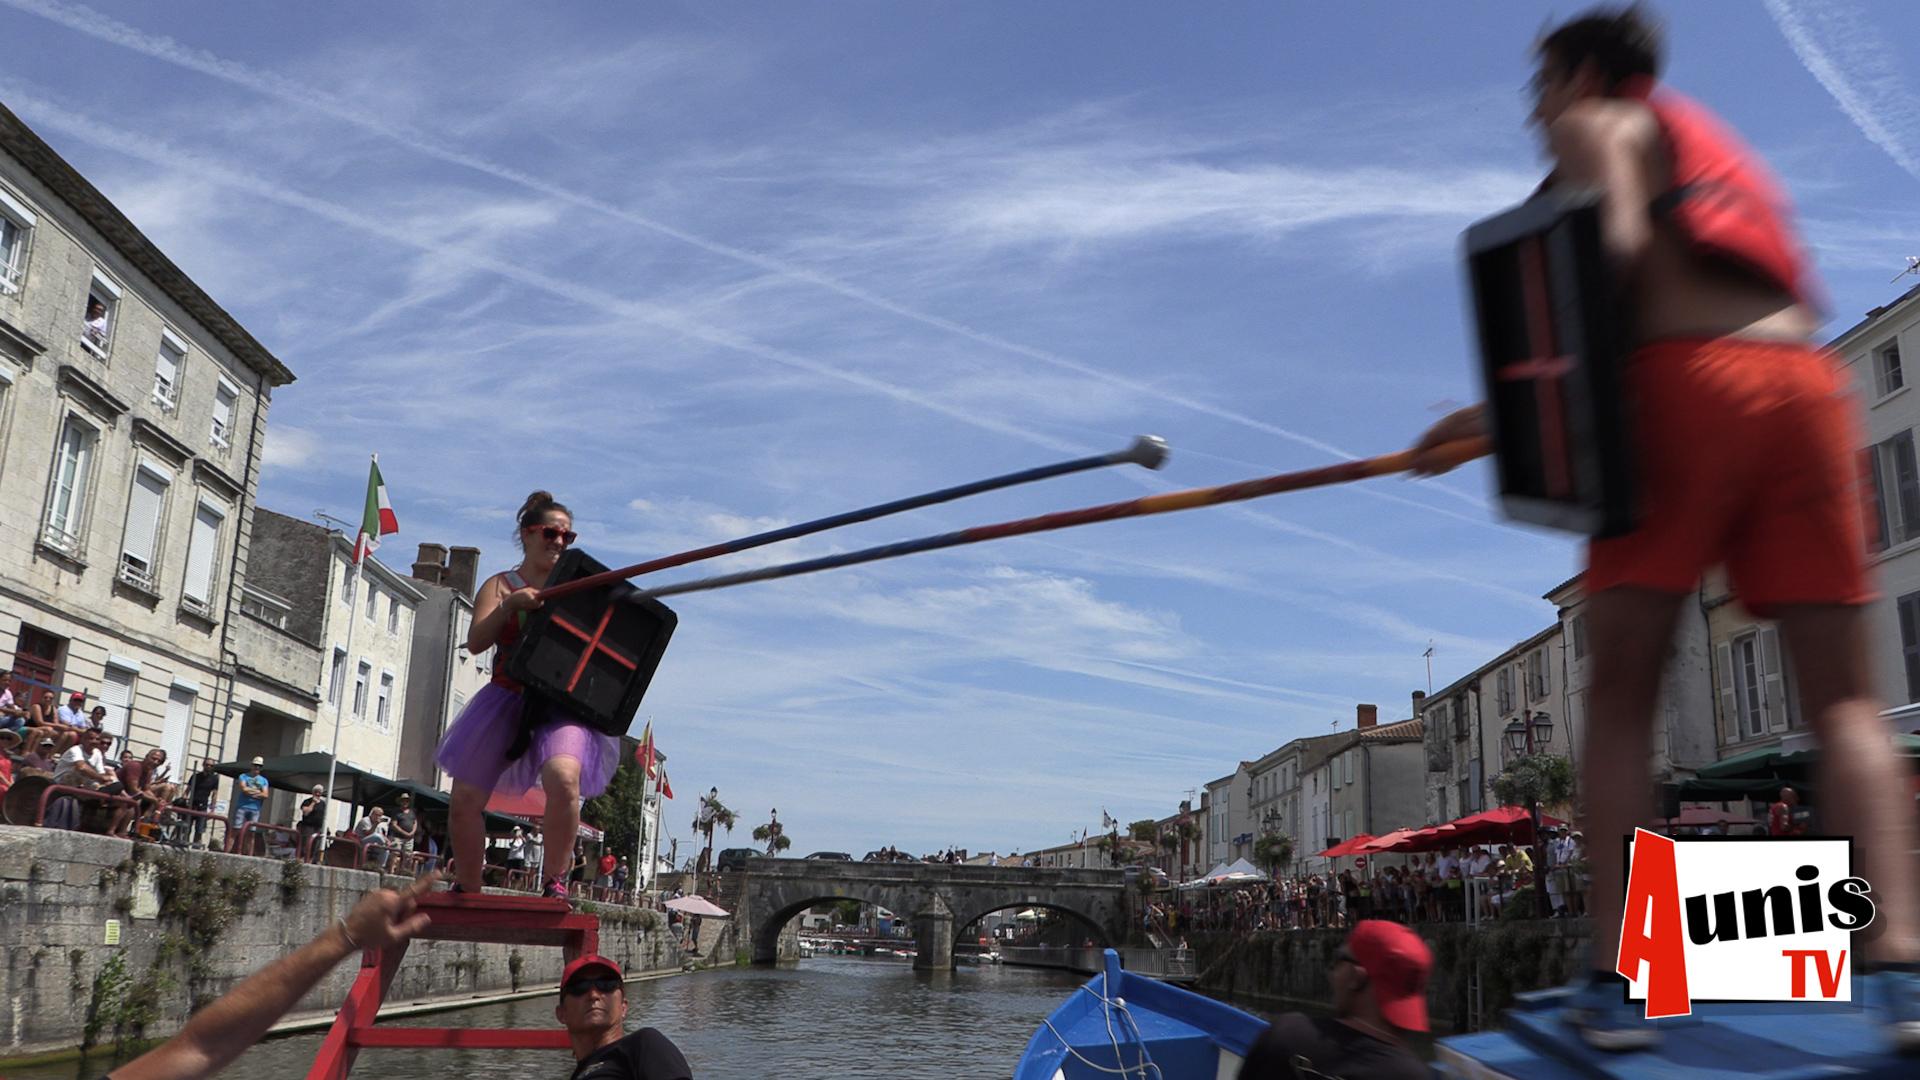 Joutes Marandaises Marans Aunis Charente Maritime